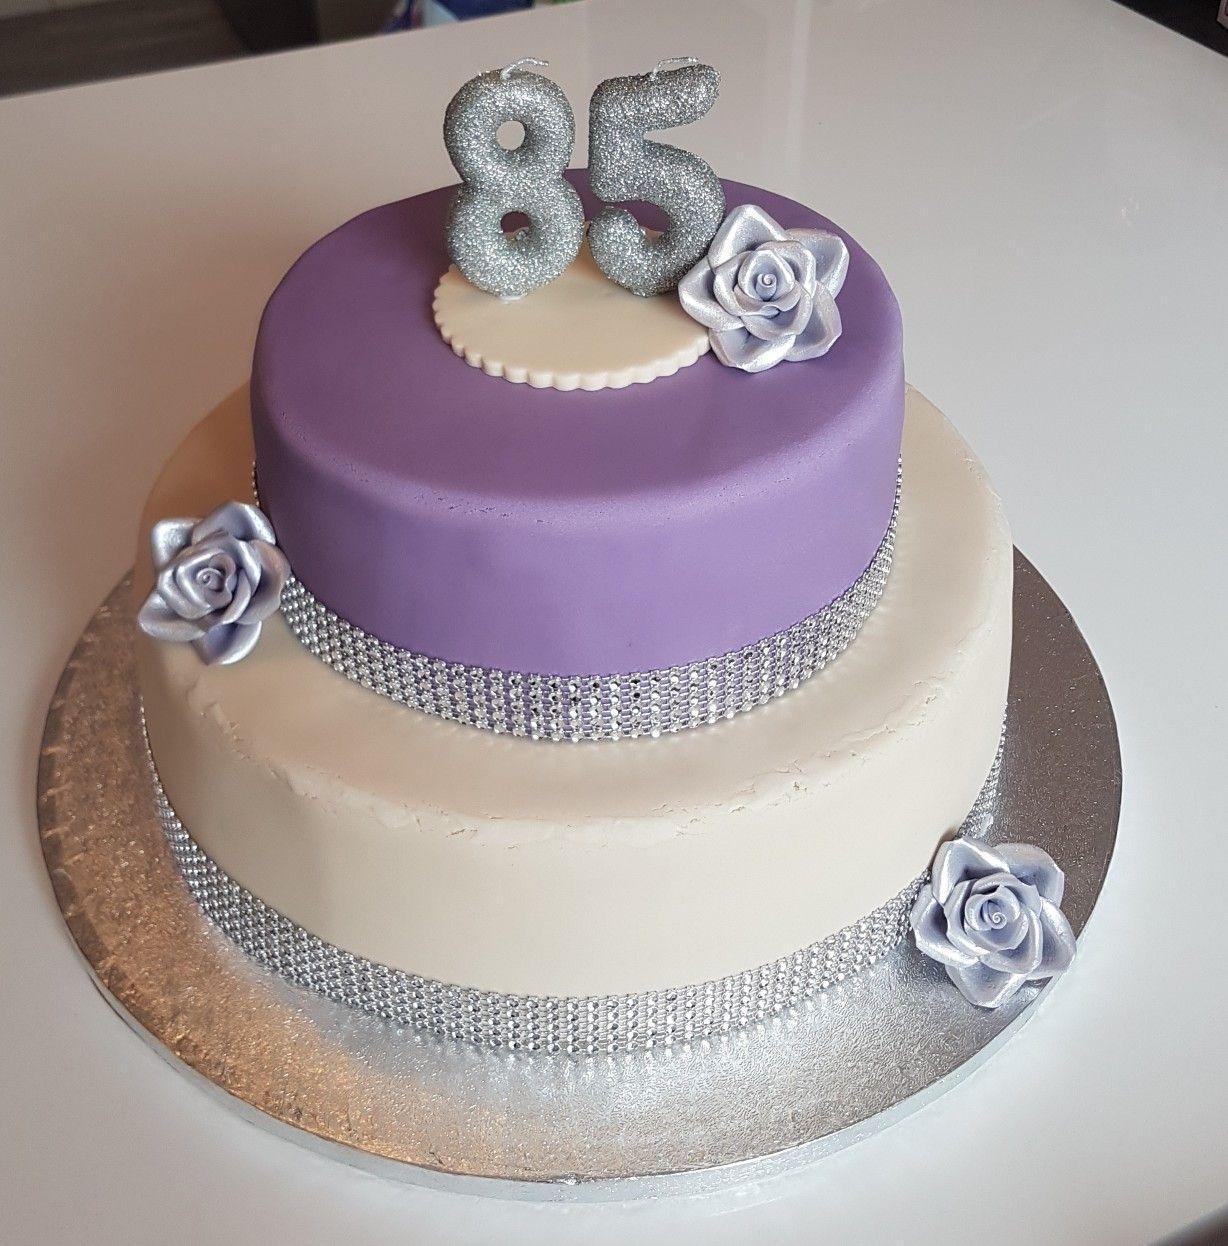 Geburtstagstorte 85 Geburtstag Geburtstagstorte Torten 85